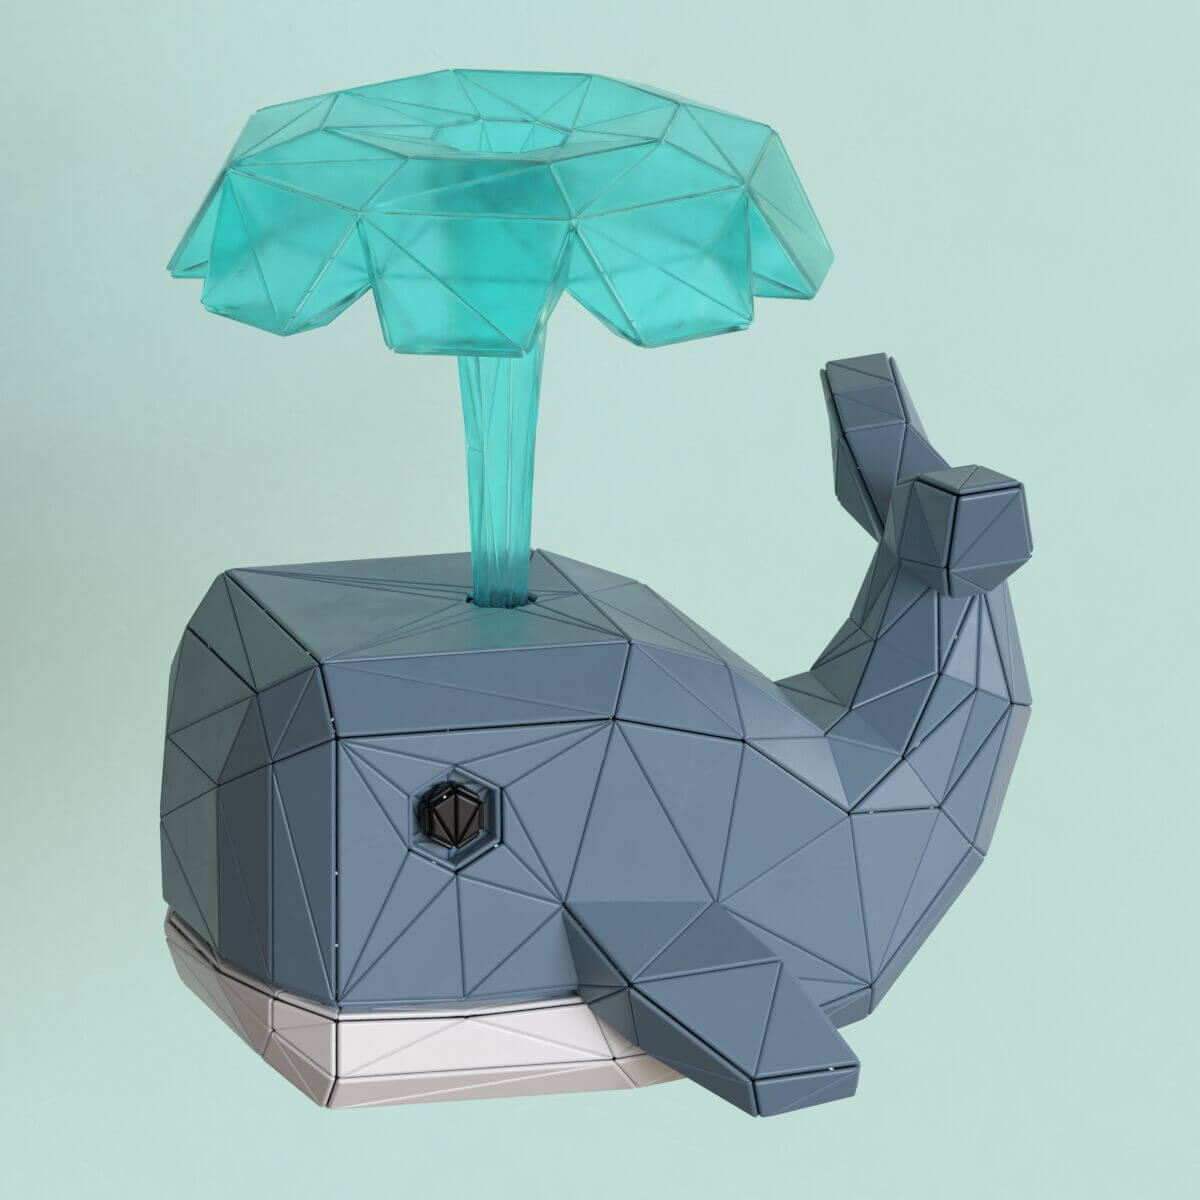 Whale low poly 3d illustration